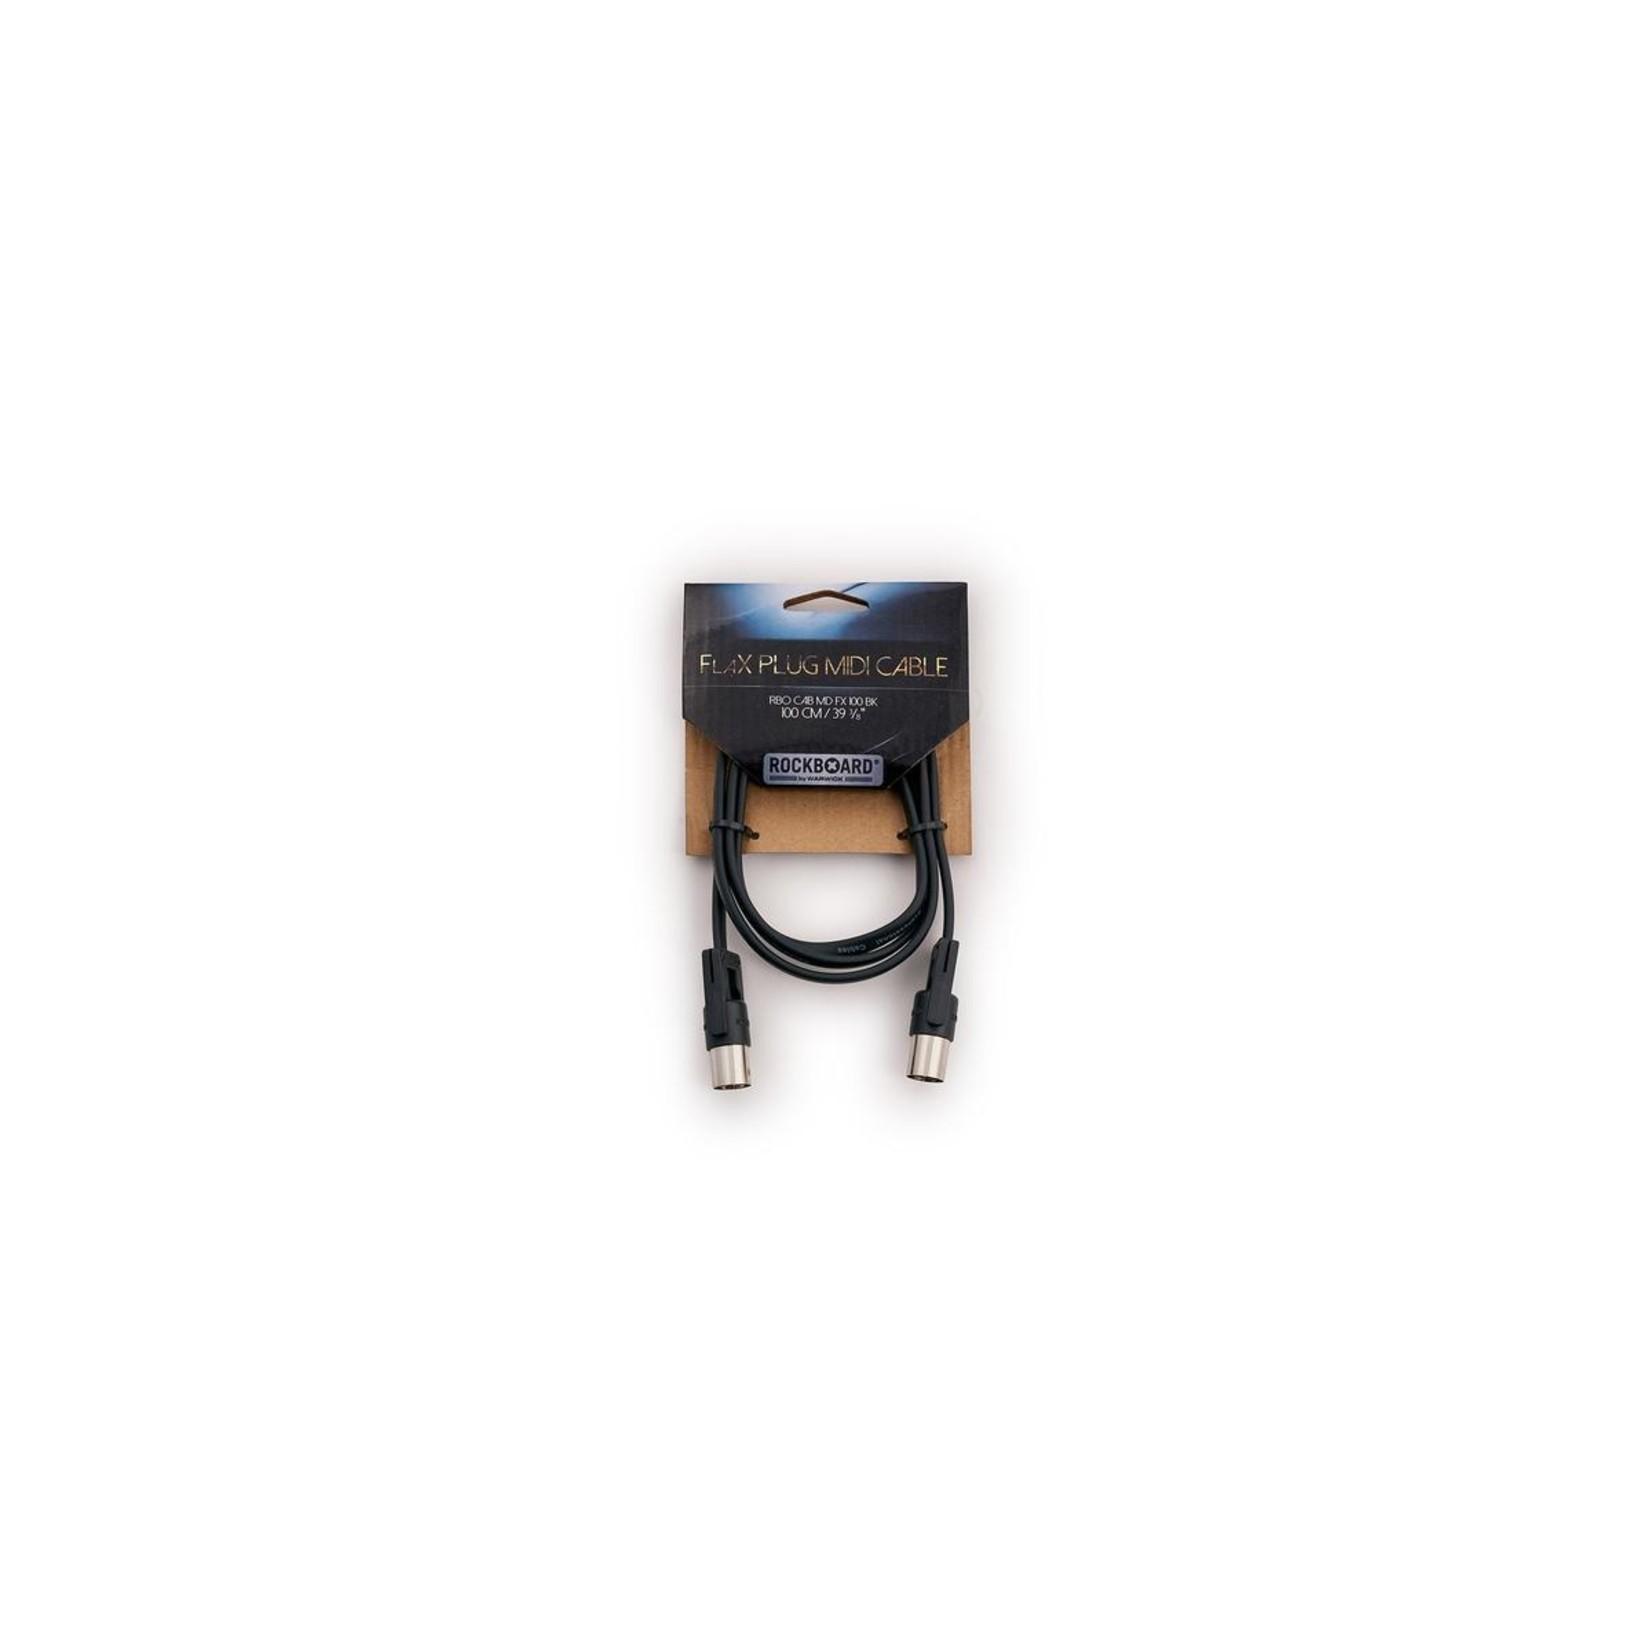 "Rockboard Rockboard FlaX Plug 100cm (39 3/8"") flat MIDI Cable - right angle or straight (RBO CAB MD FX 100 BK)"